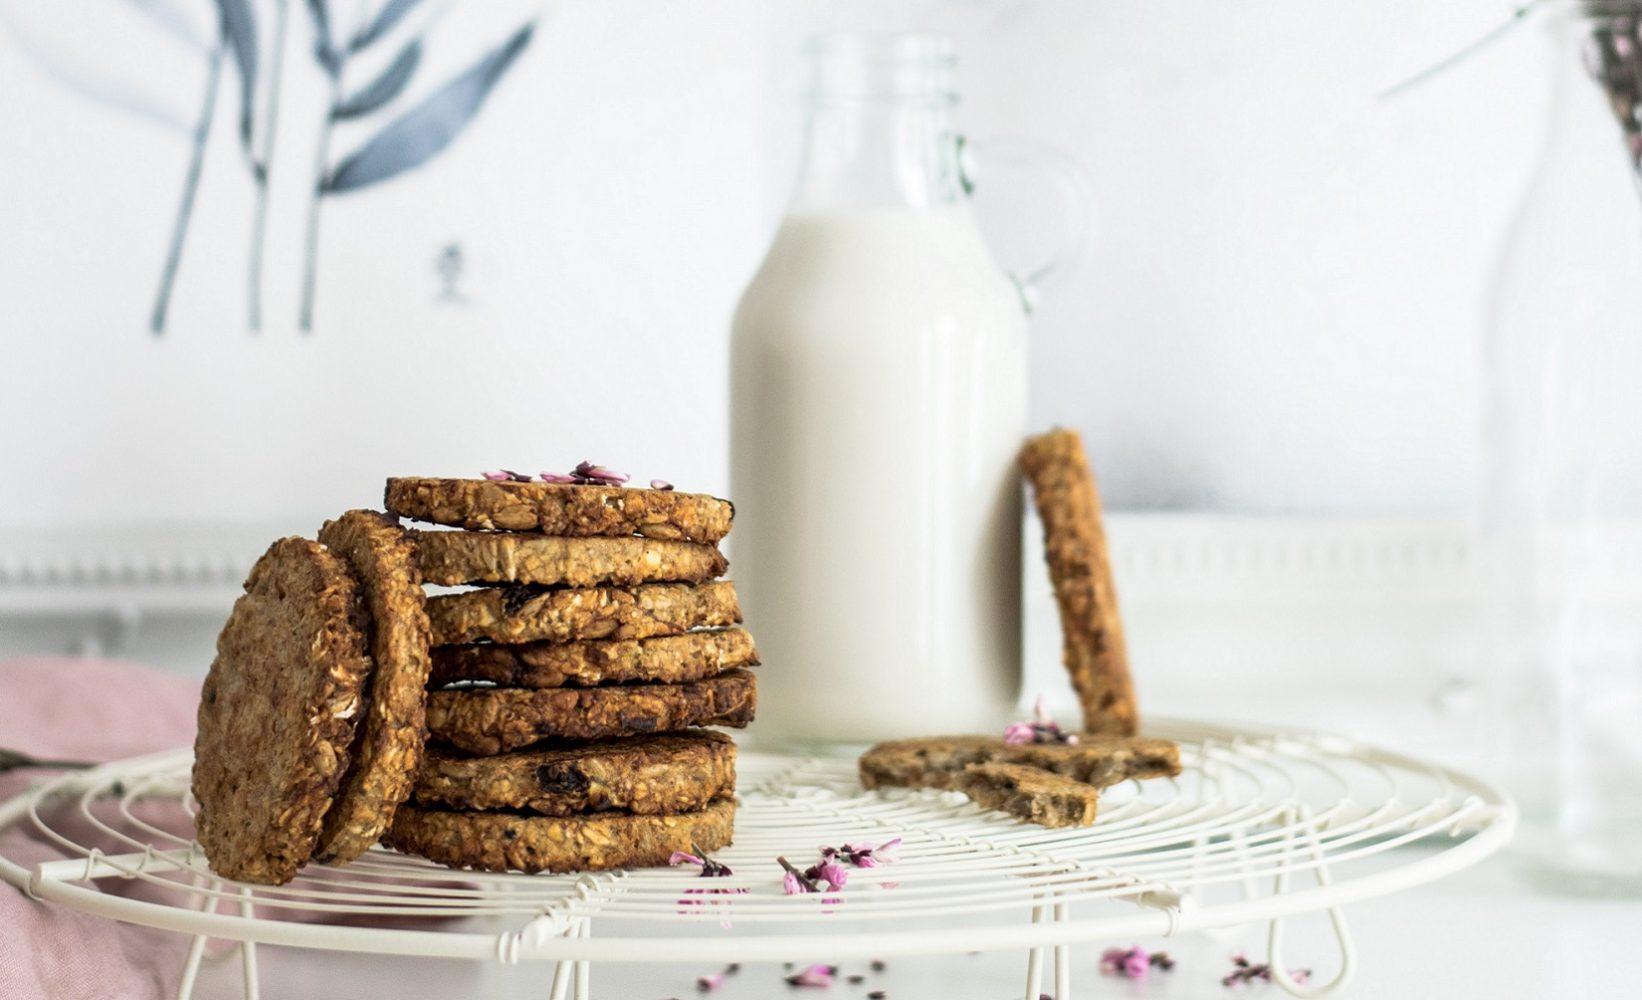 galletas caseras de avena ecologica